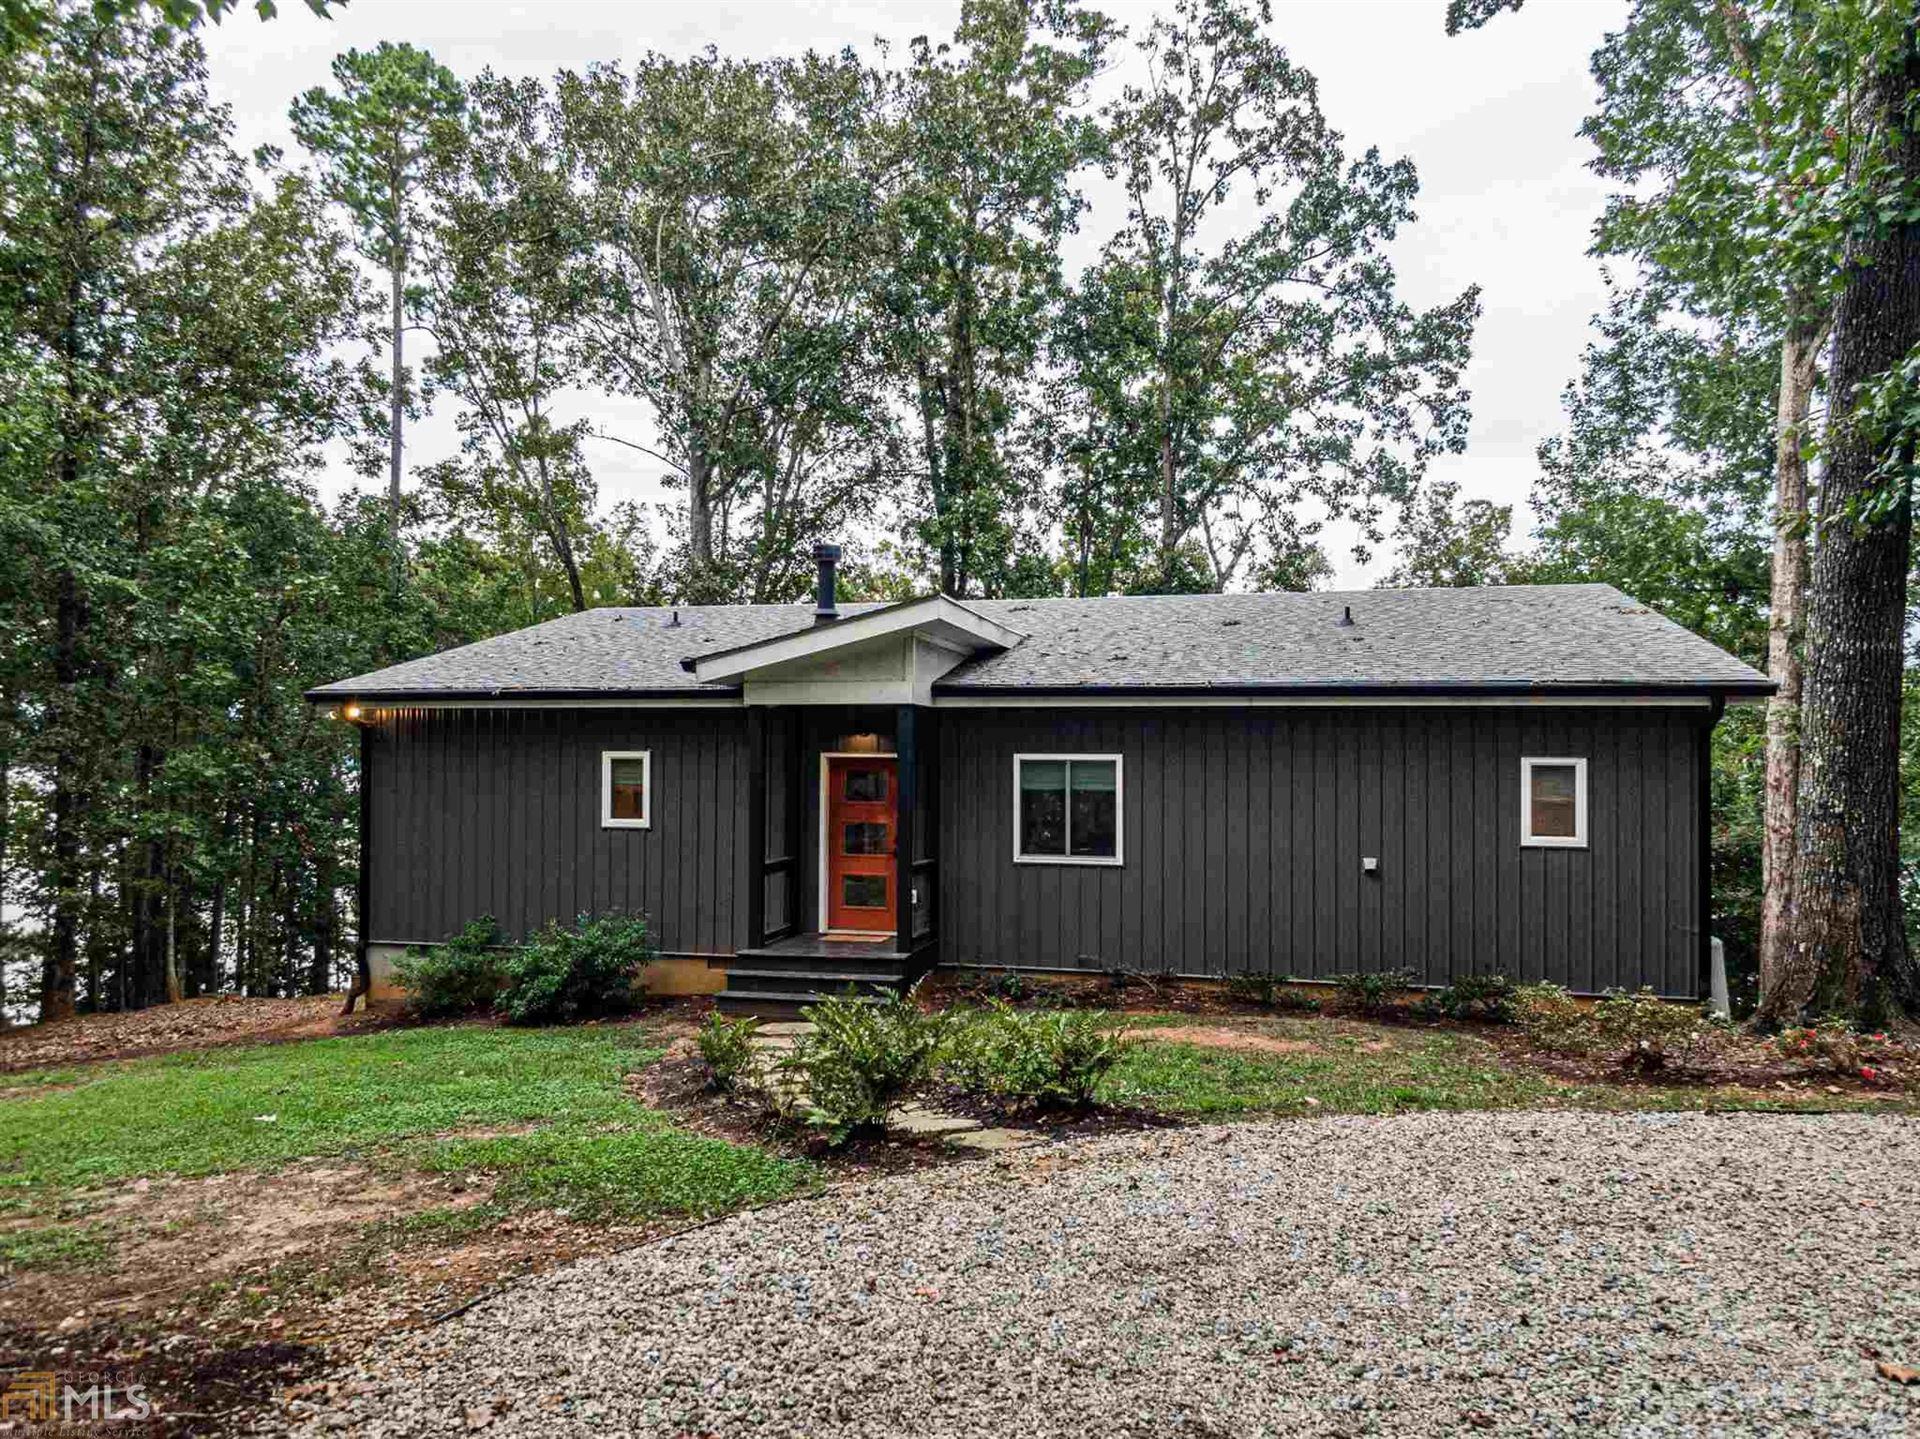 1720 Shady Oaks Ln, Greensboro, GA 30642 - MLS#: 8943169